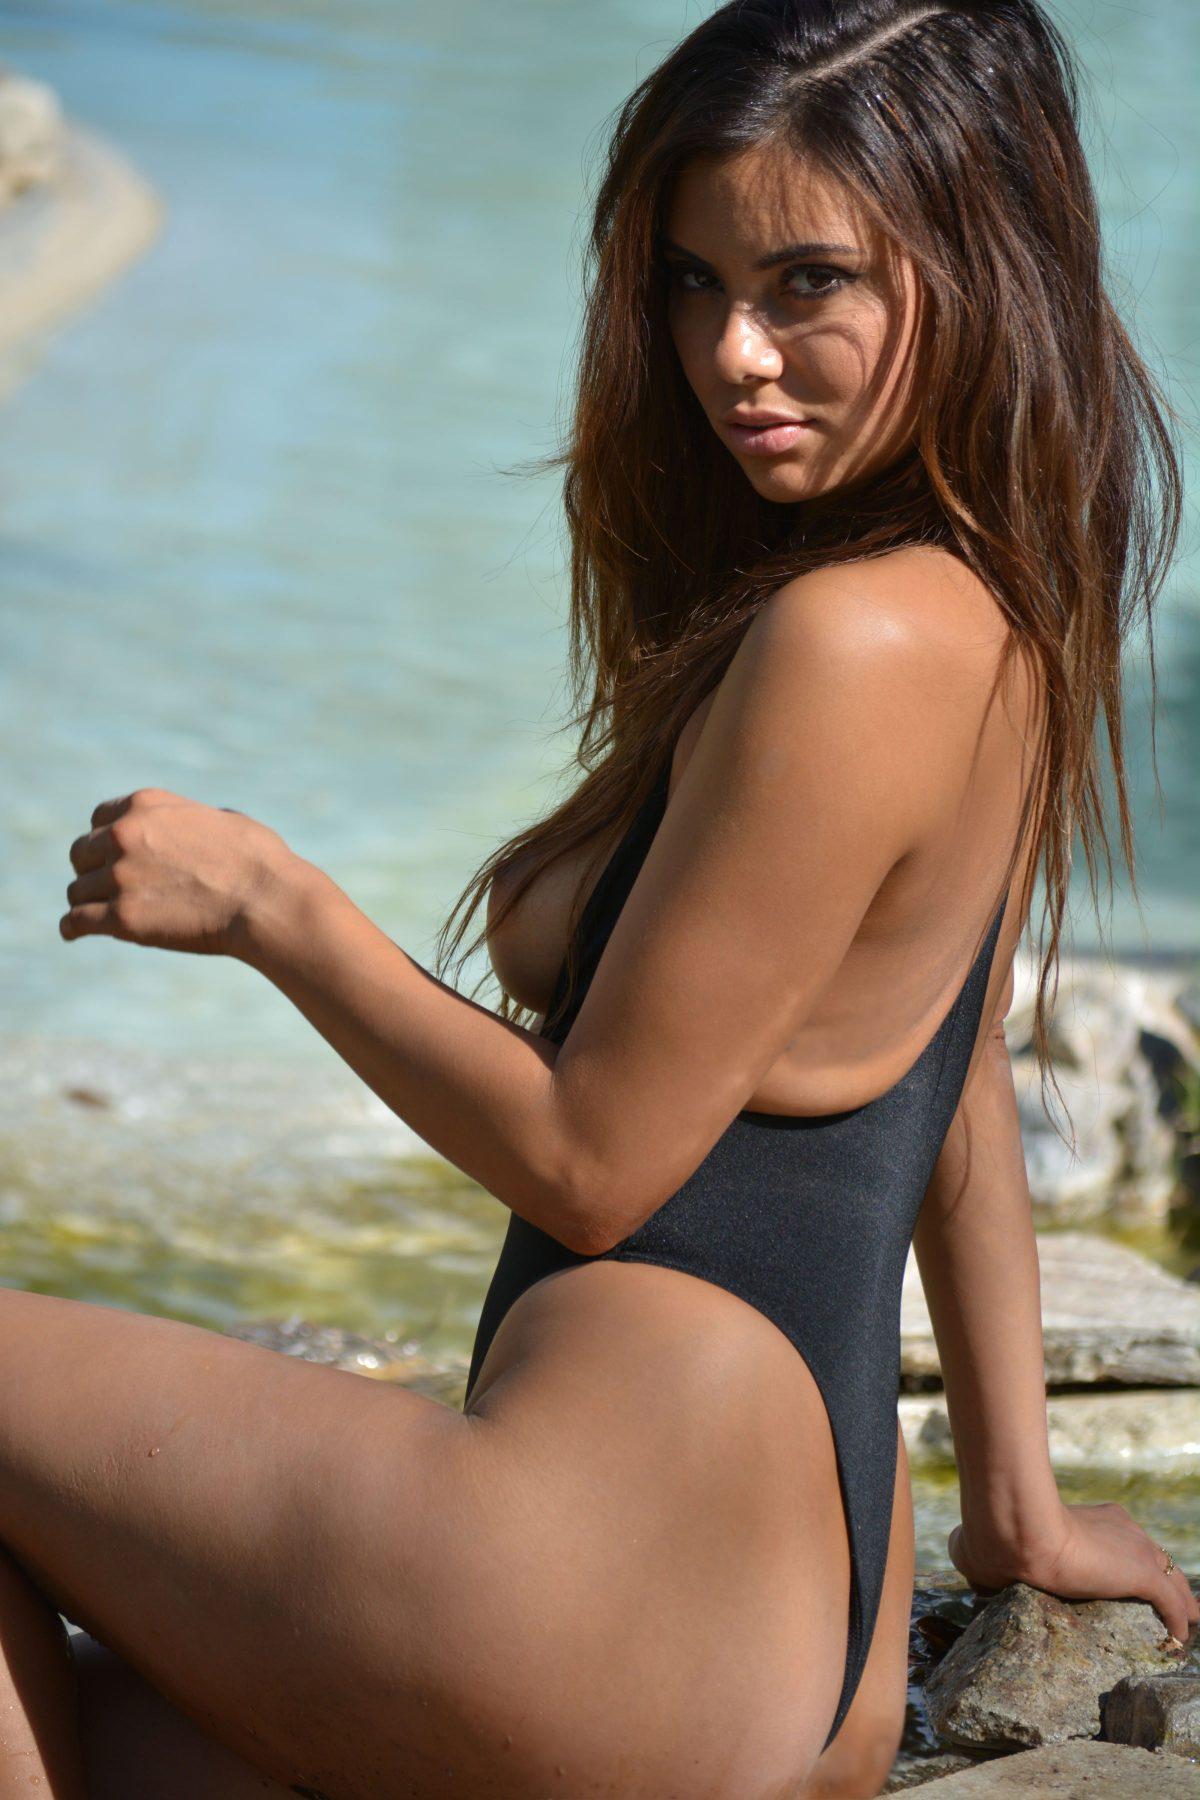 Model Actress Photos Pictures Swimsuit Bikini Sunbathing